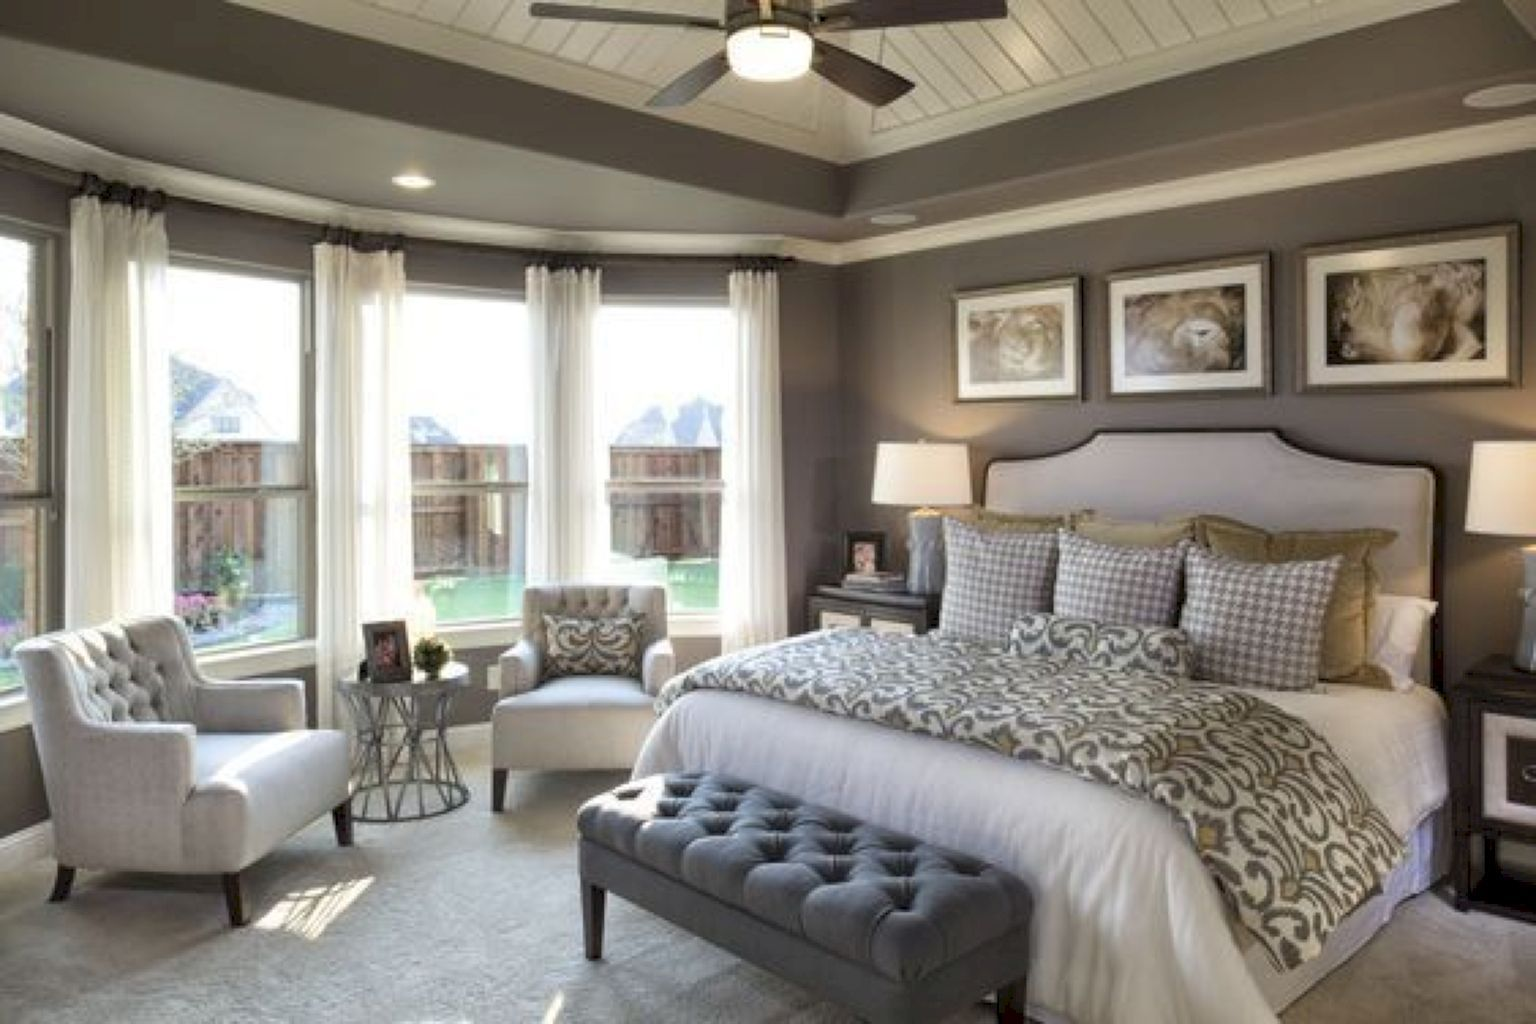 Cool 50 Master Bedroom Remodel Ideas On A Budget Https://insidedecor.net